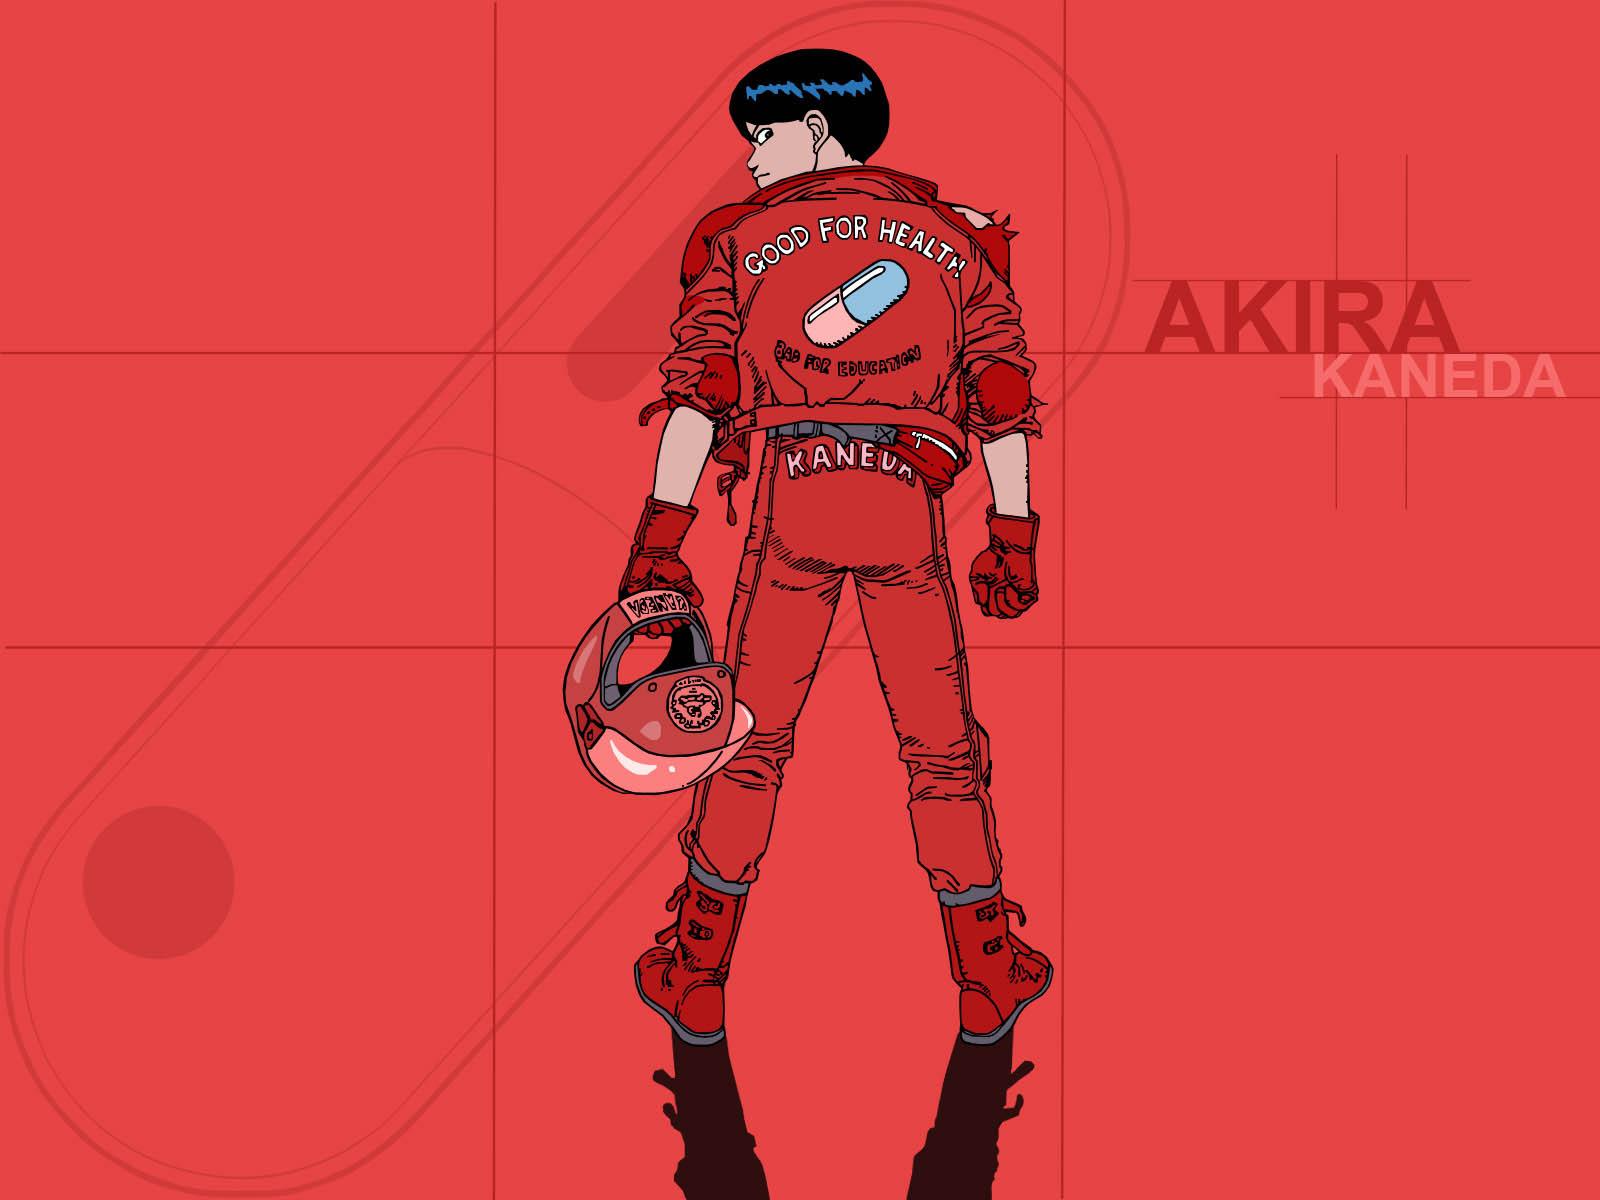 Akira Kaneda 1600x1200 Download Hd Wallpaper Wallpapertip